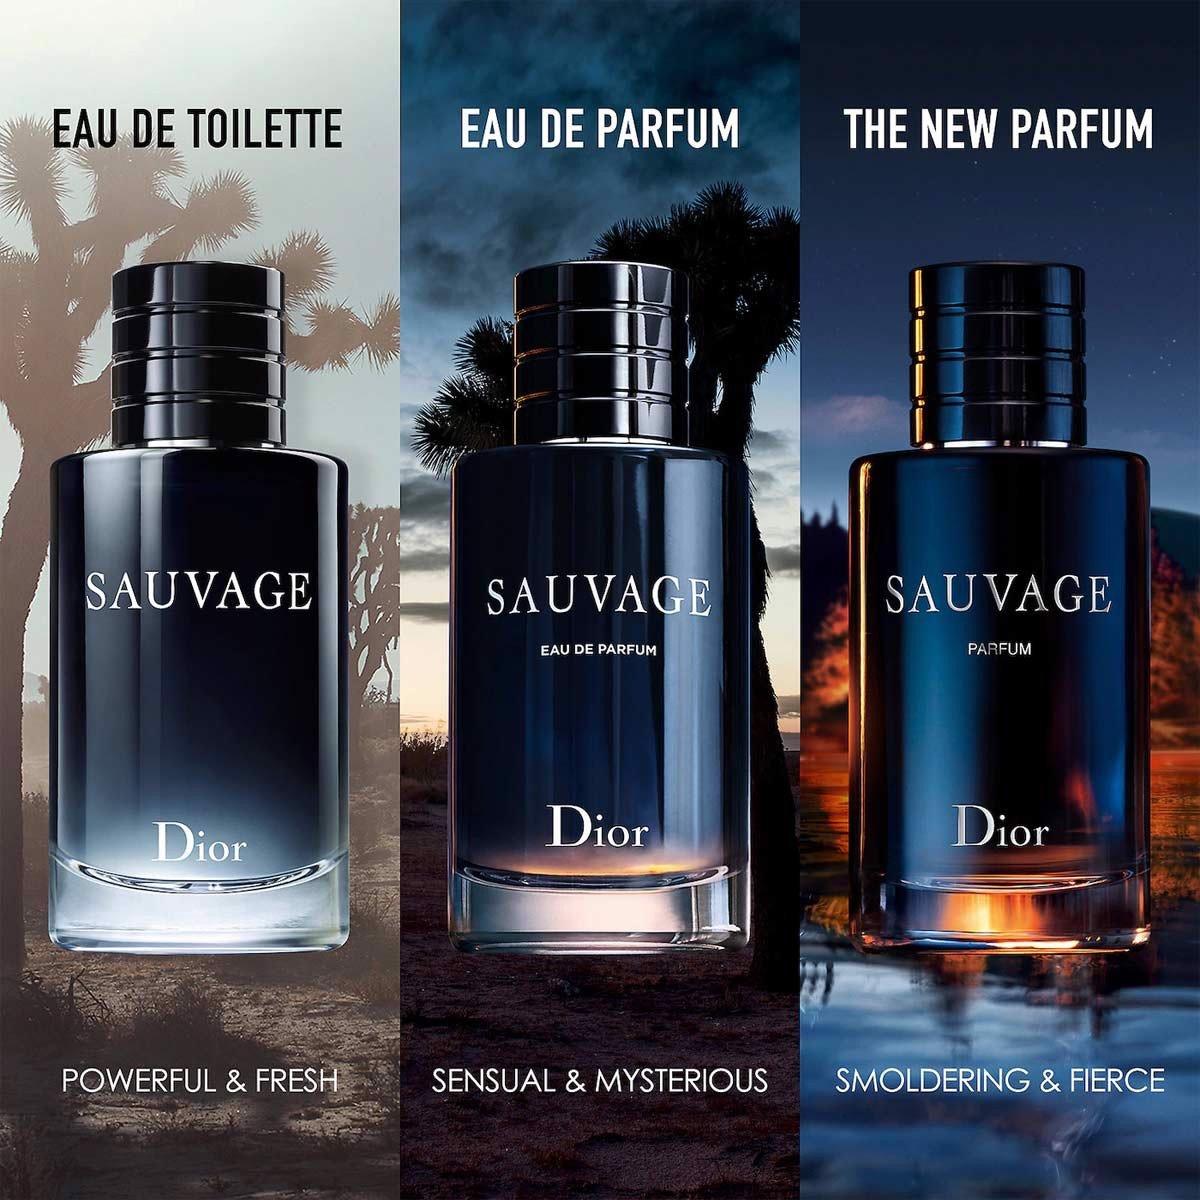 Nước hoa Dior Sauvage Eau de Parfum   namperfume